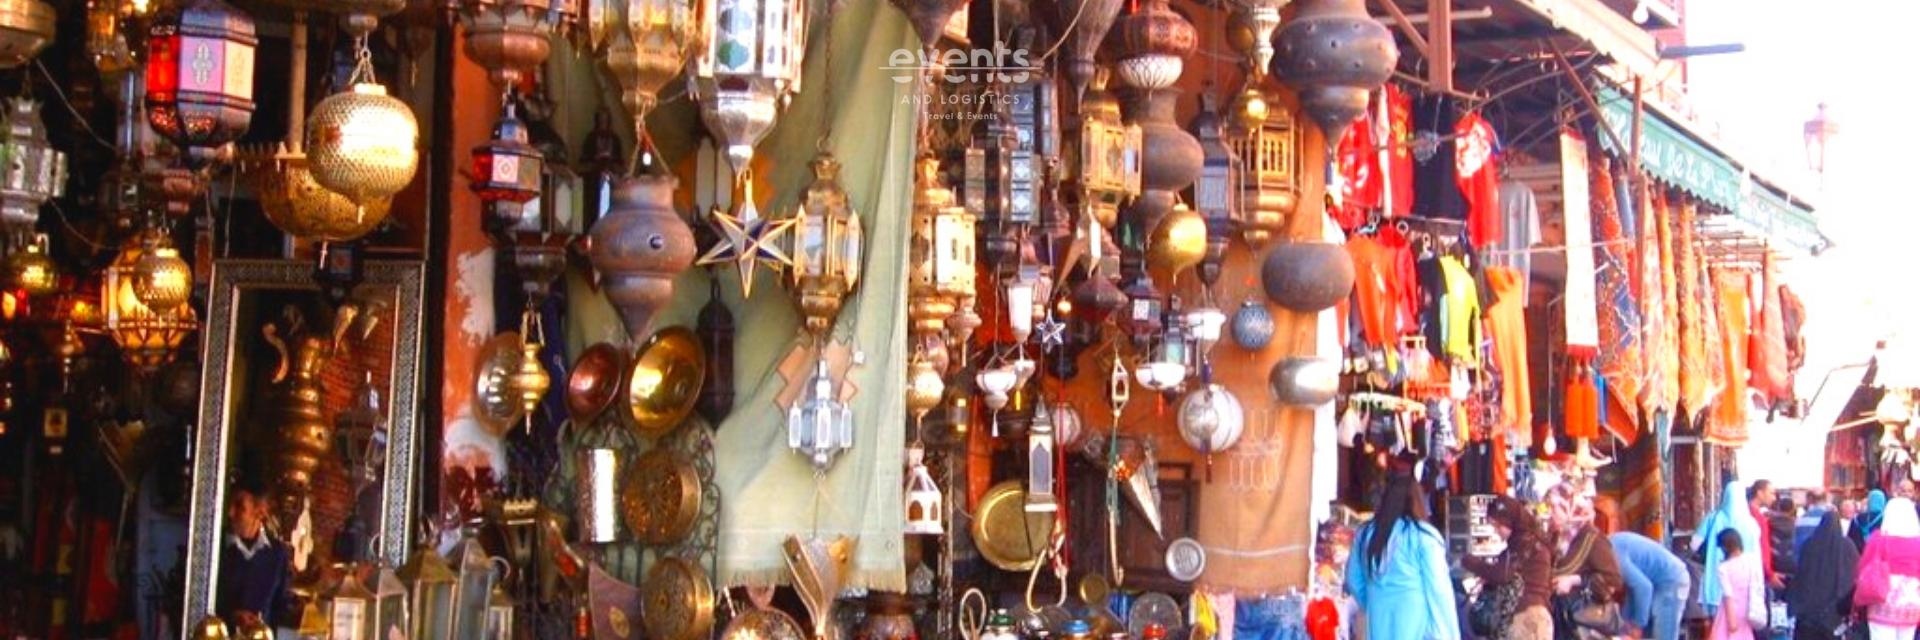 Sortie shopping dans la médina de Marrakech